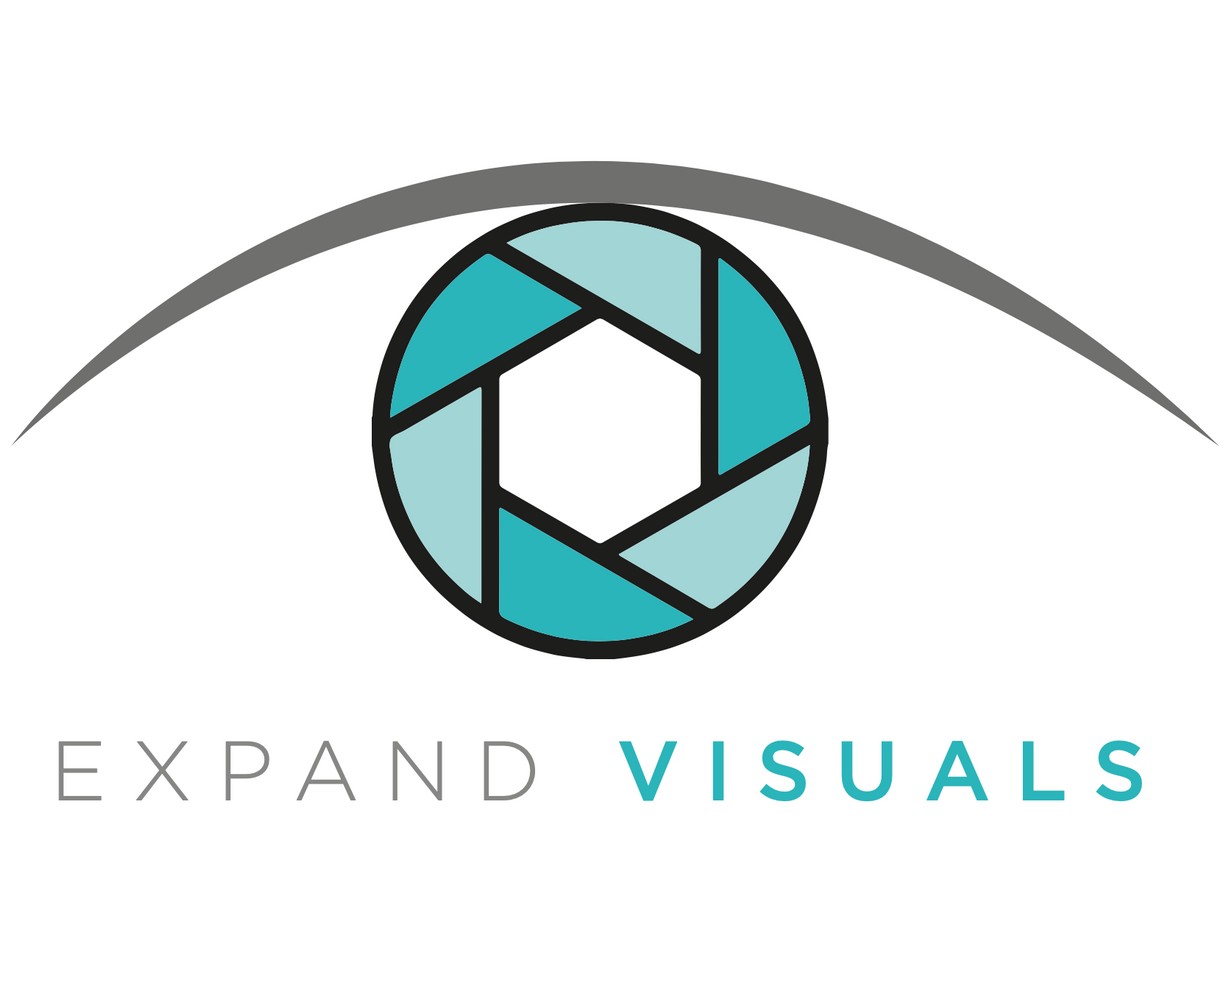 EXPAND VISUALS